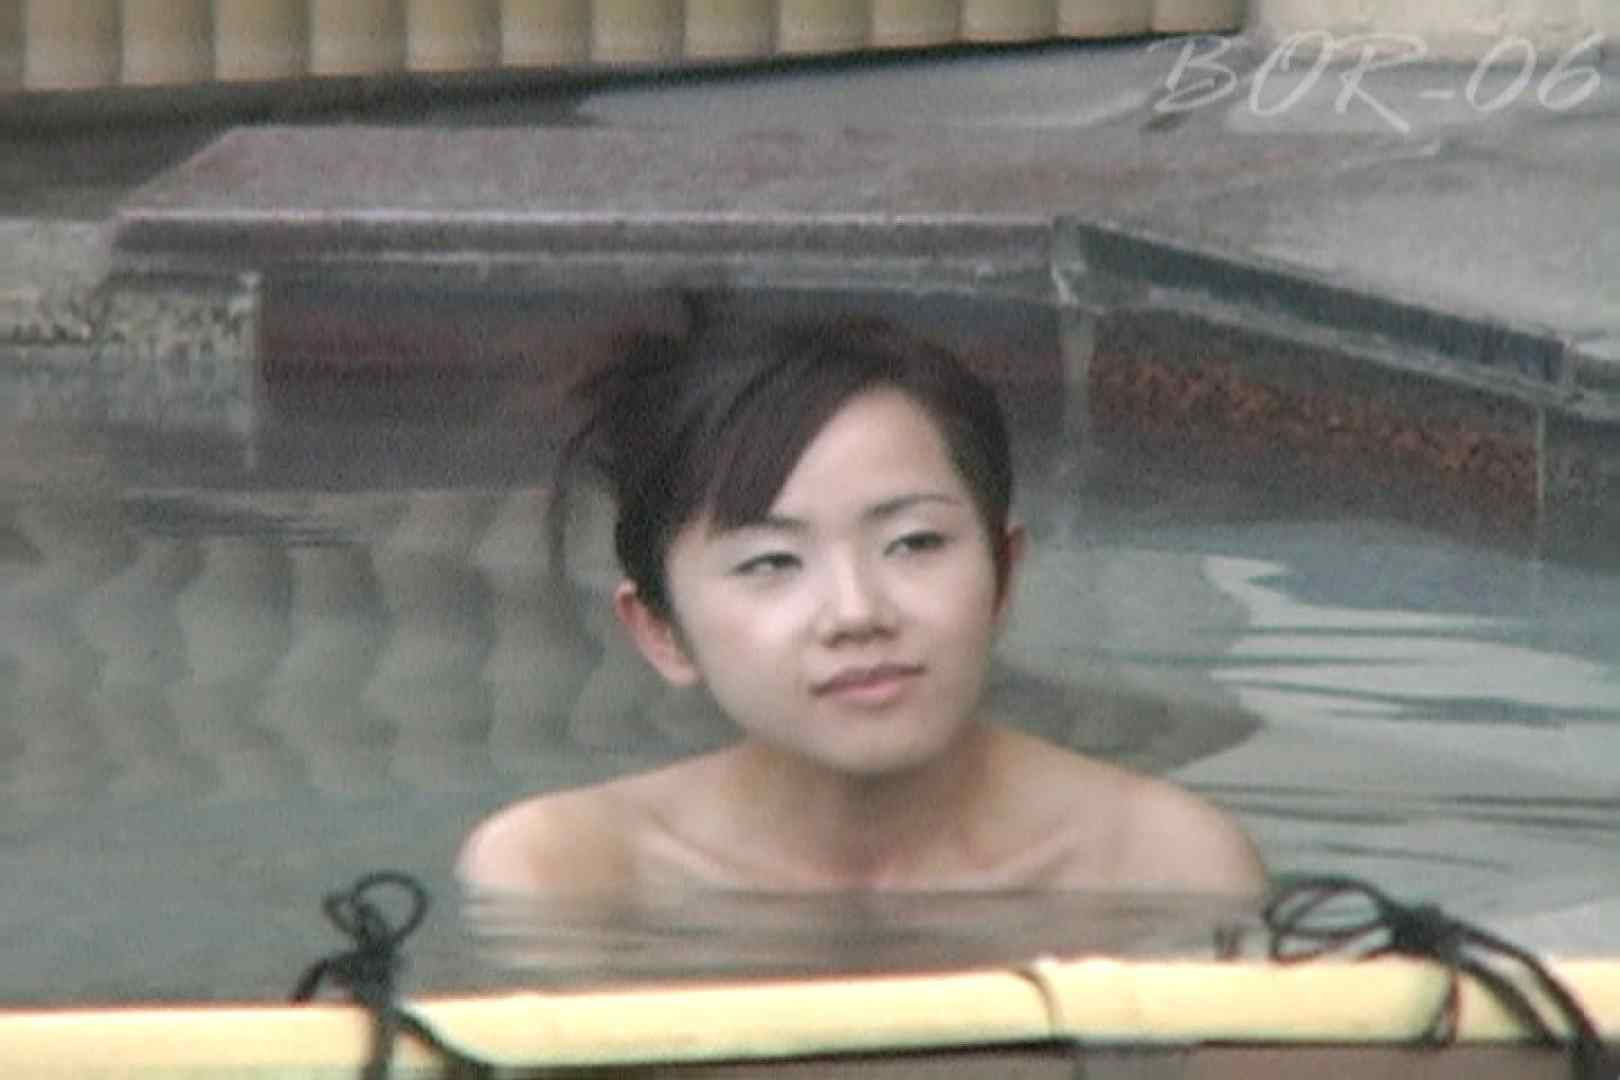 Aquaな露天風呂Vol.521 露天 おめこ無修正動画無料 92画像 44